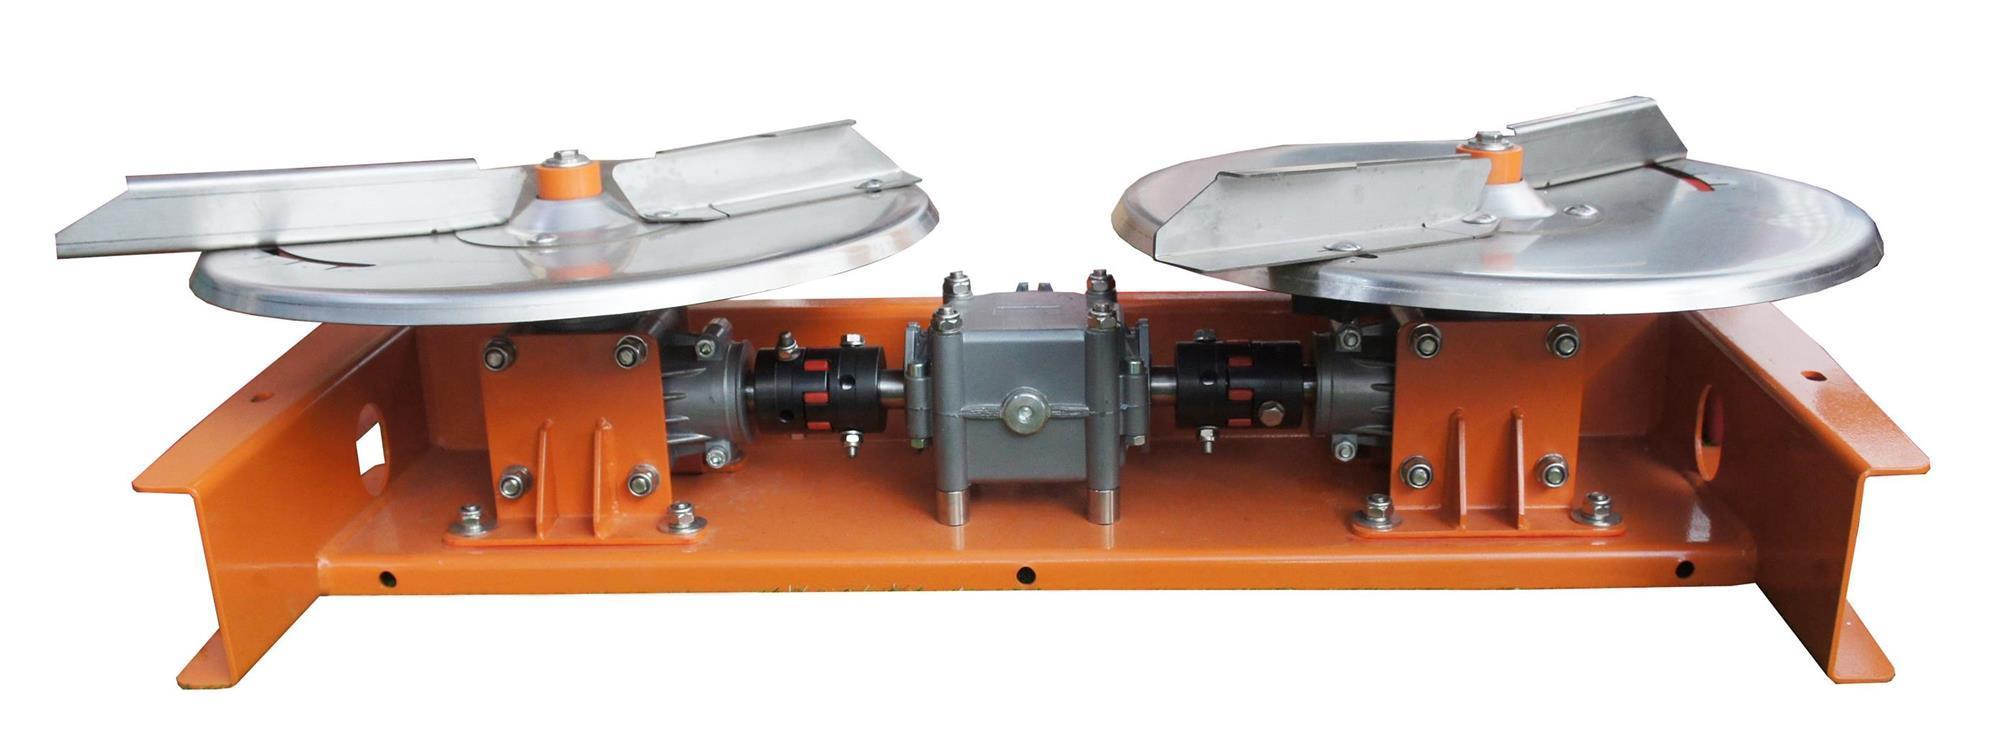 gearbox dirve system